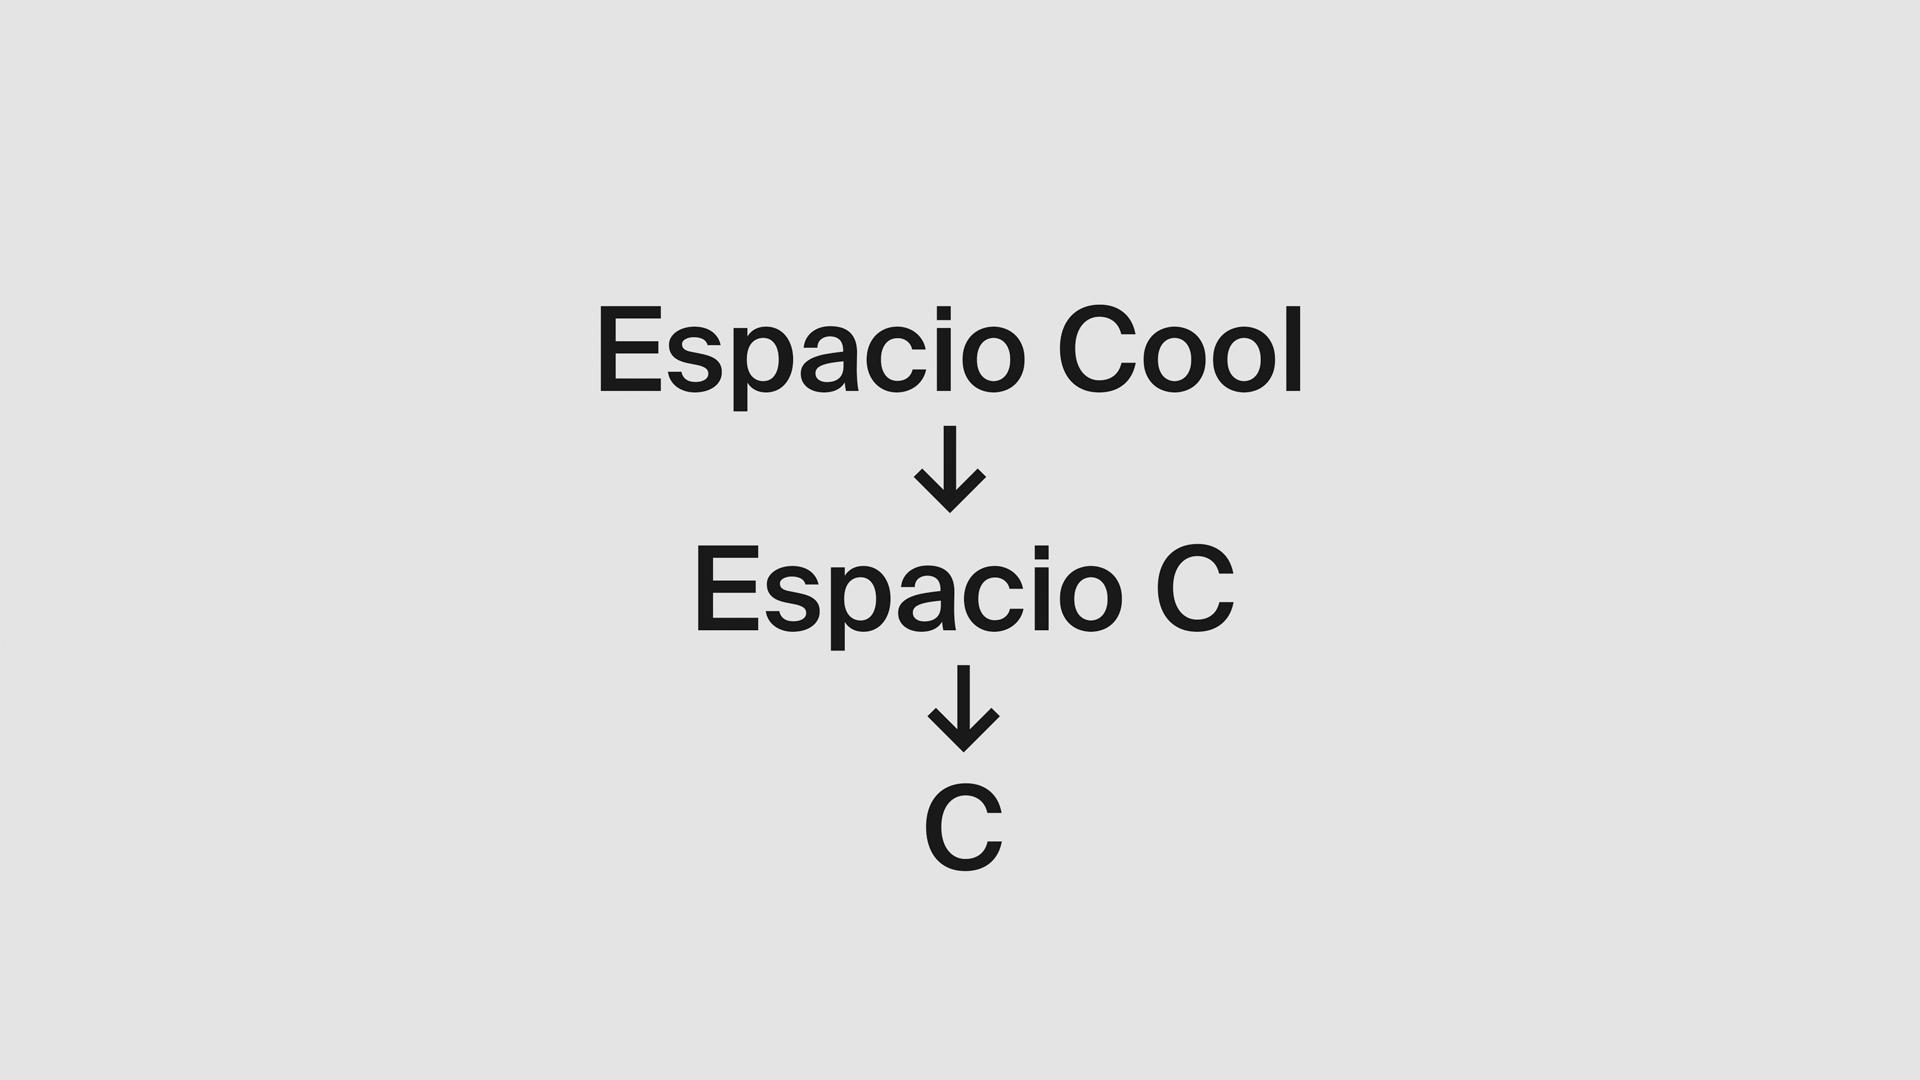 espacio-c-hair-lifestyle-identity-branding-03